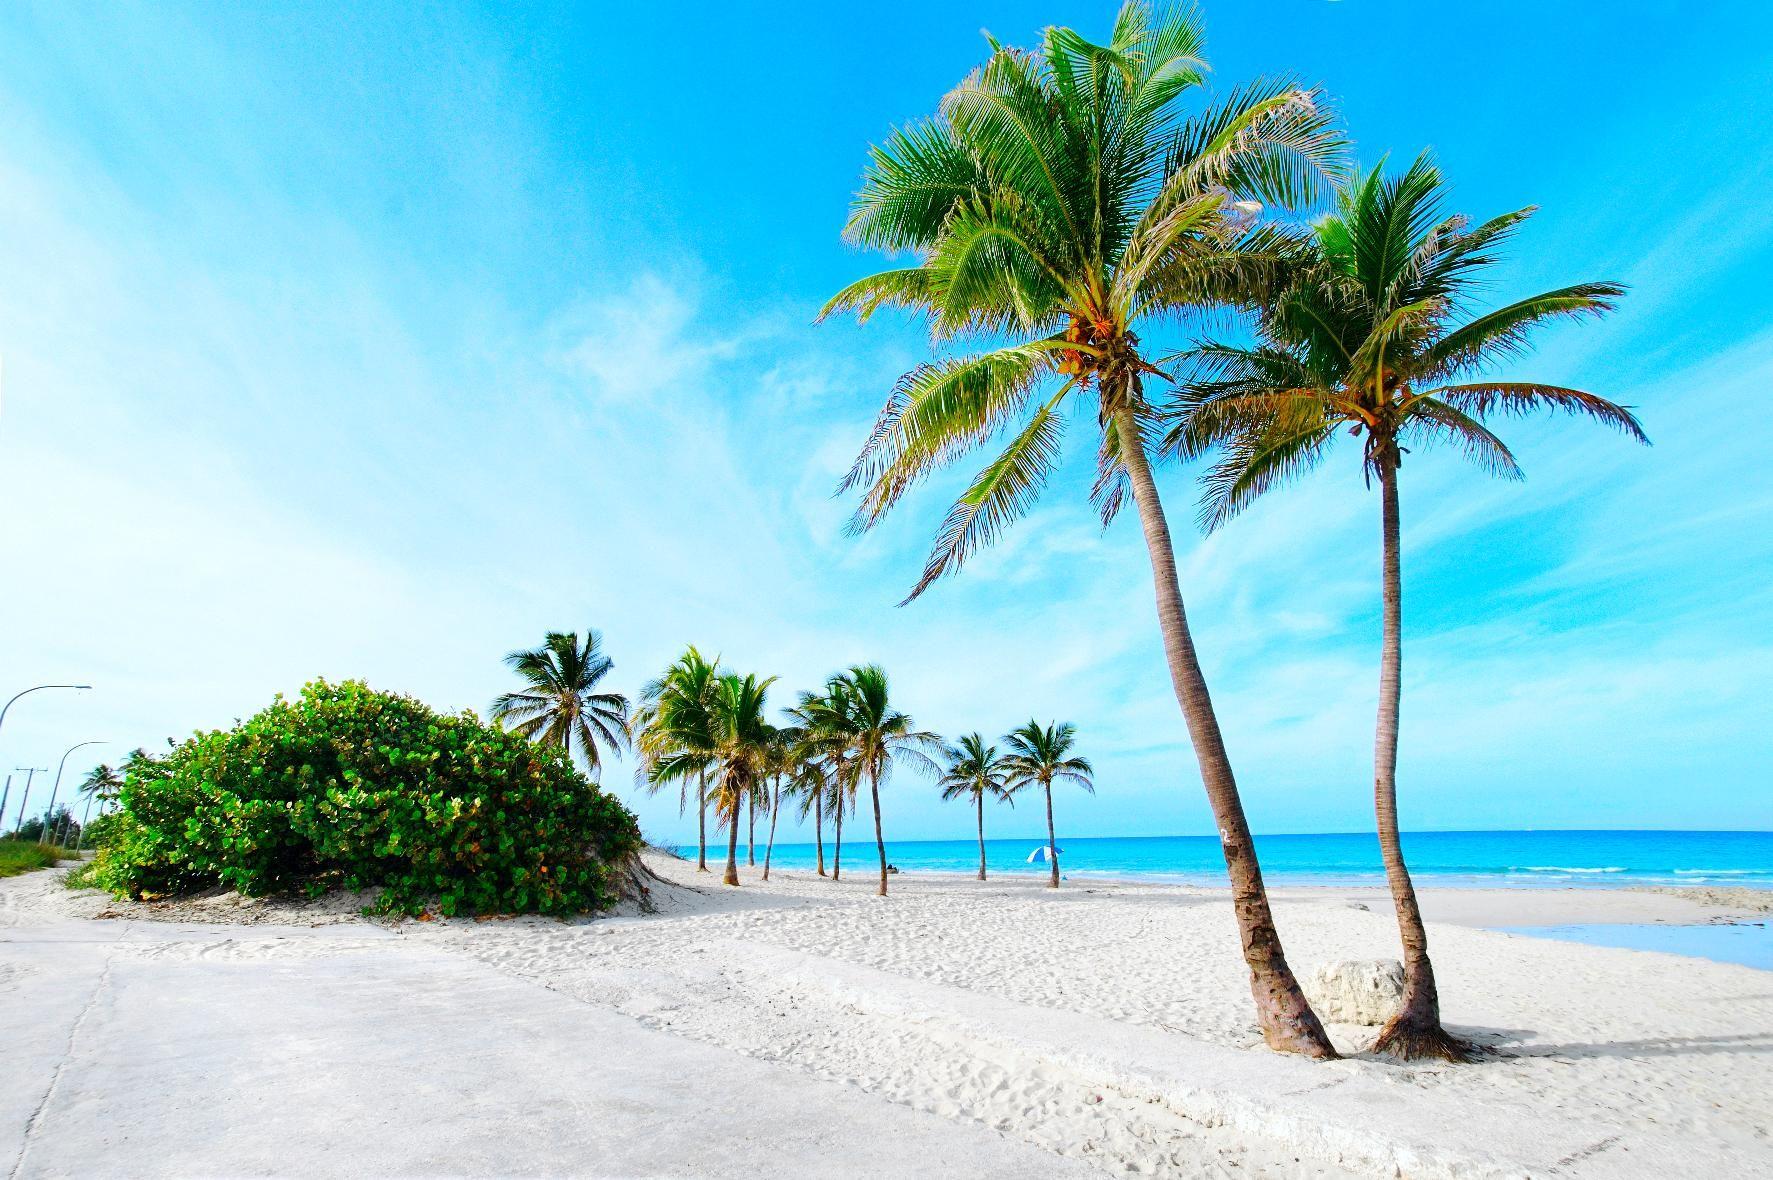 Cayo Santa Maria Cuba www.cubacayosantamaria.com #cayosantamaria  #cubabeaches #cubaresorts #cubavacations #cubaholi…   Cayo santa maria,  Going to cuba, Cuba beaches